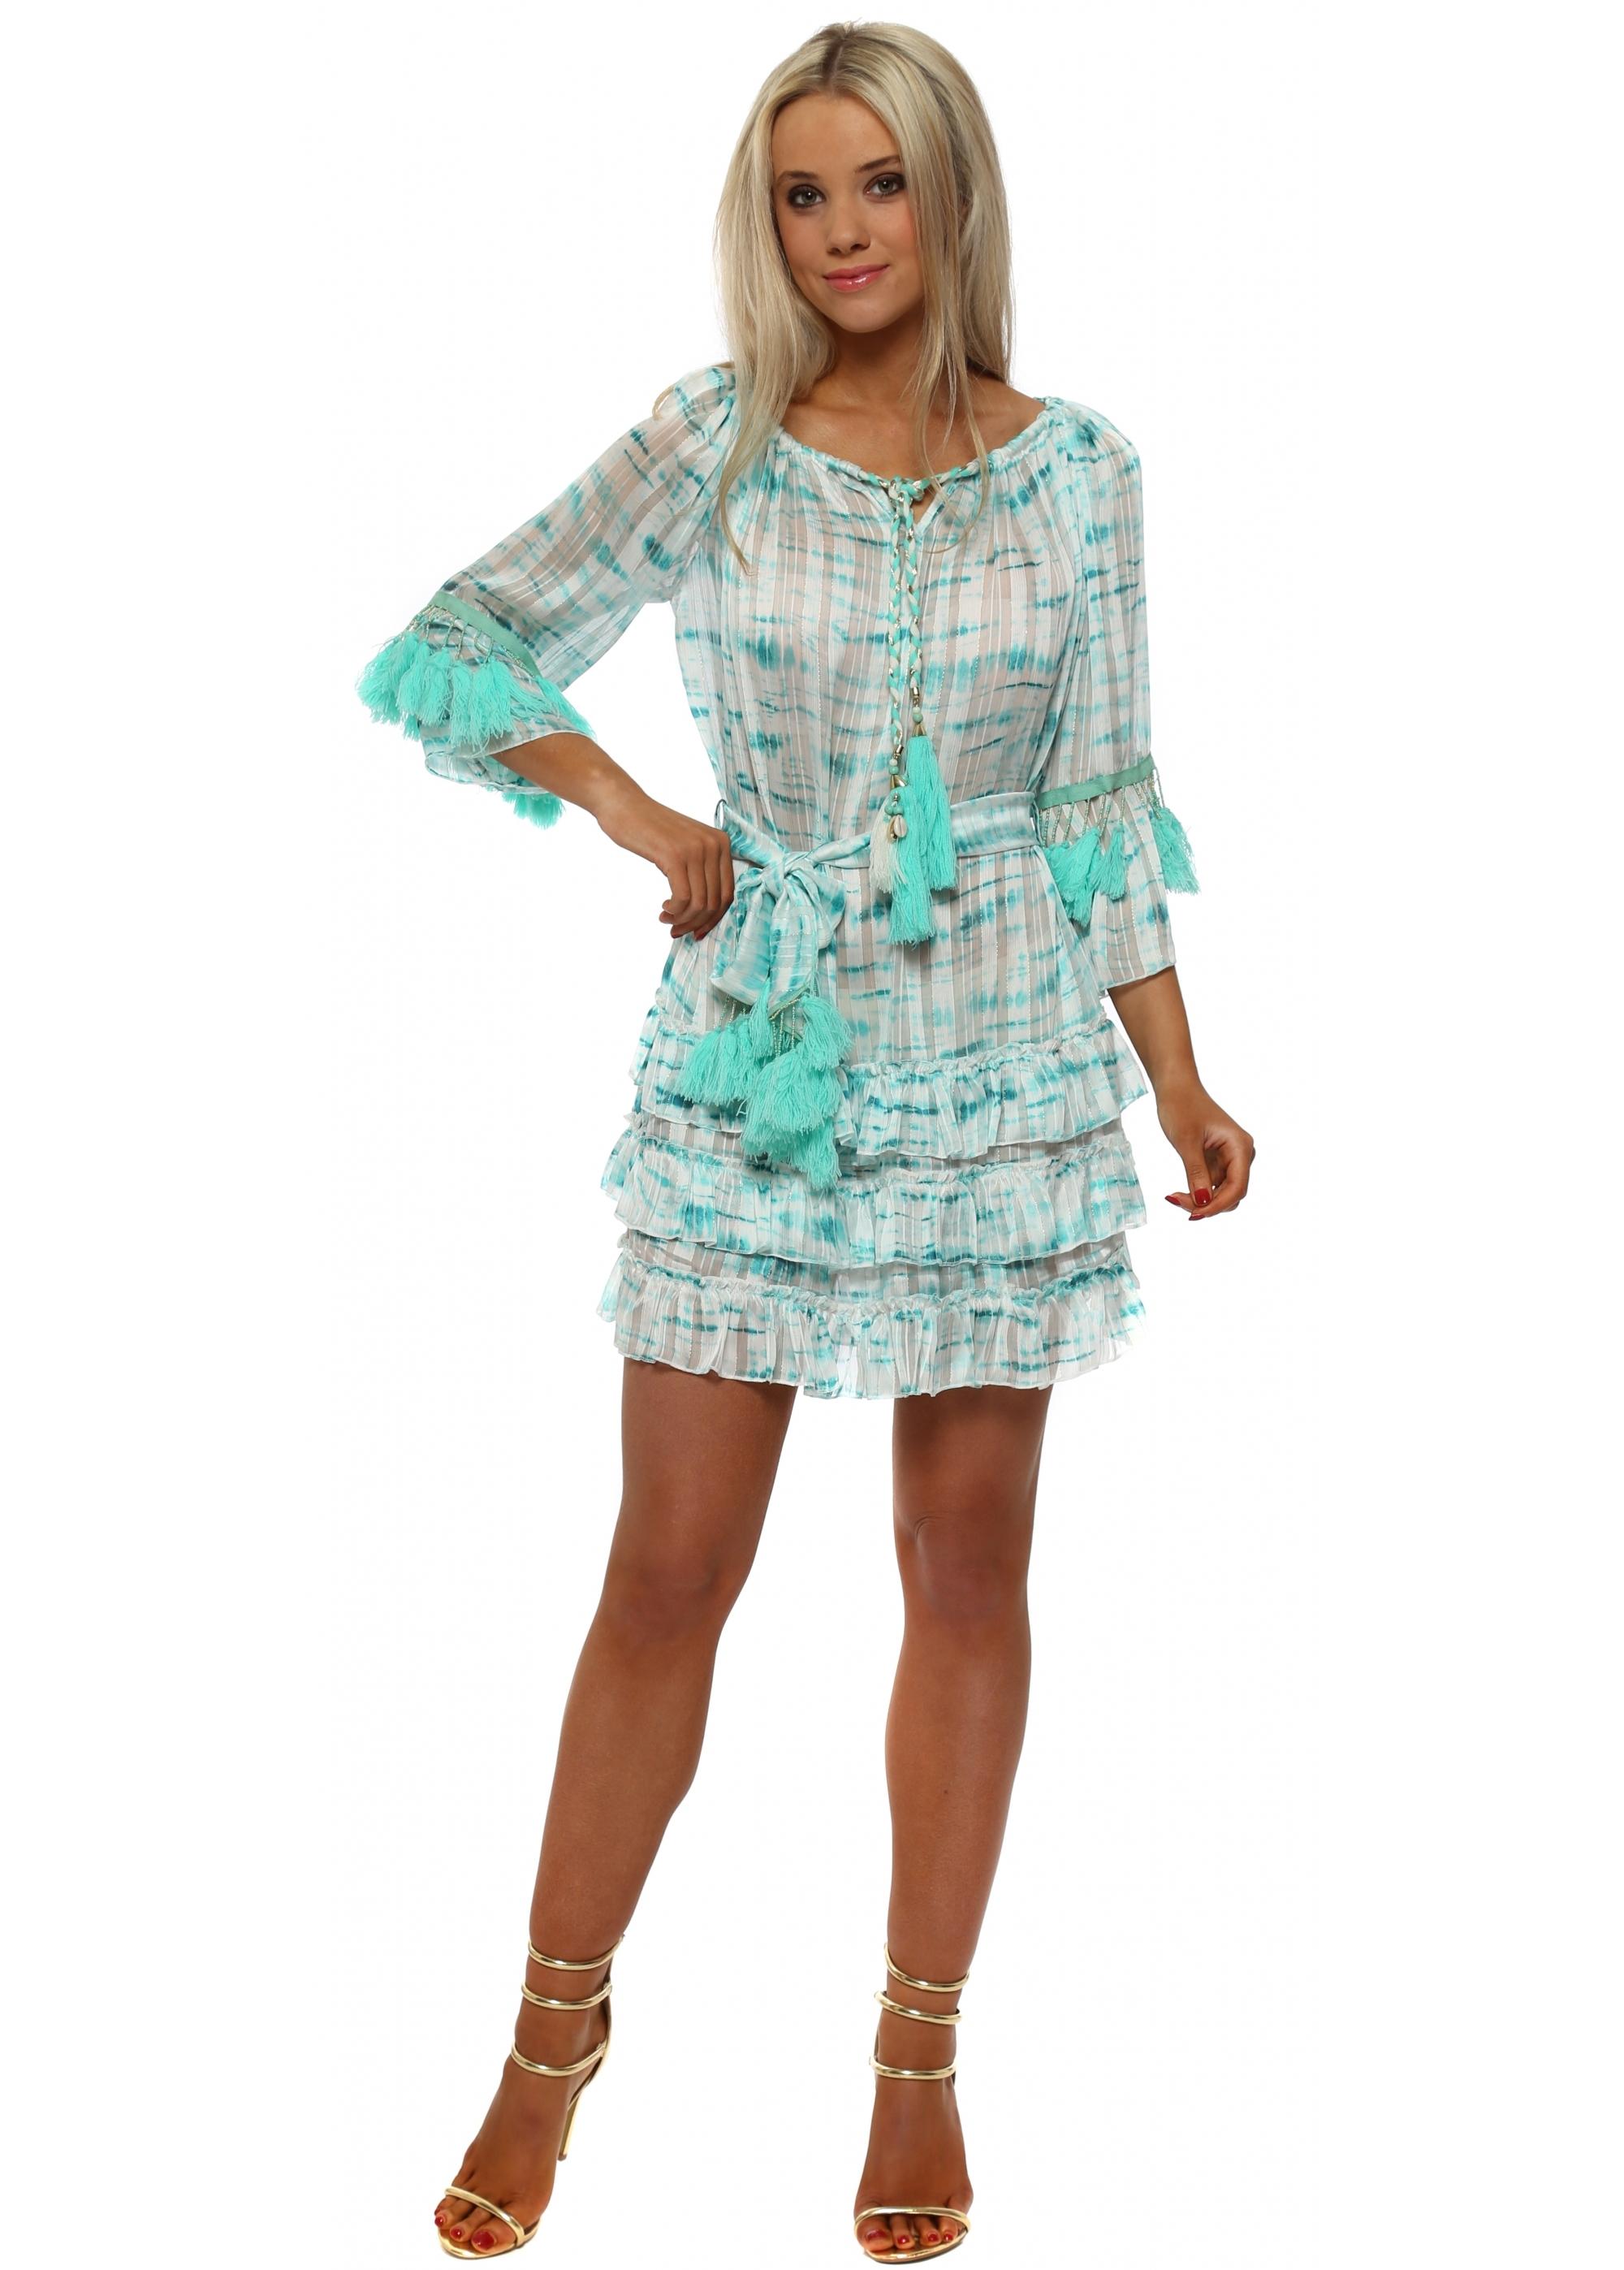 Laurie & Joe Turquoise Tie Dye Chiffon Mini Dress